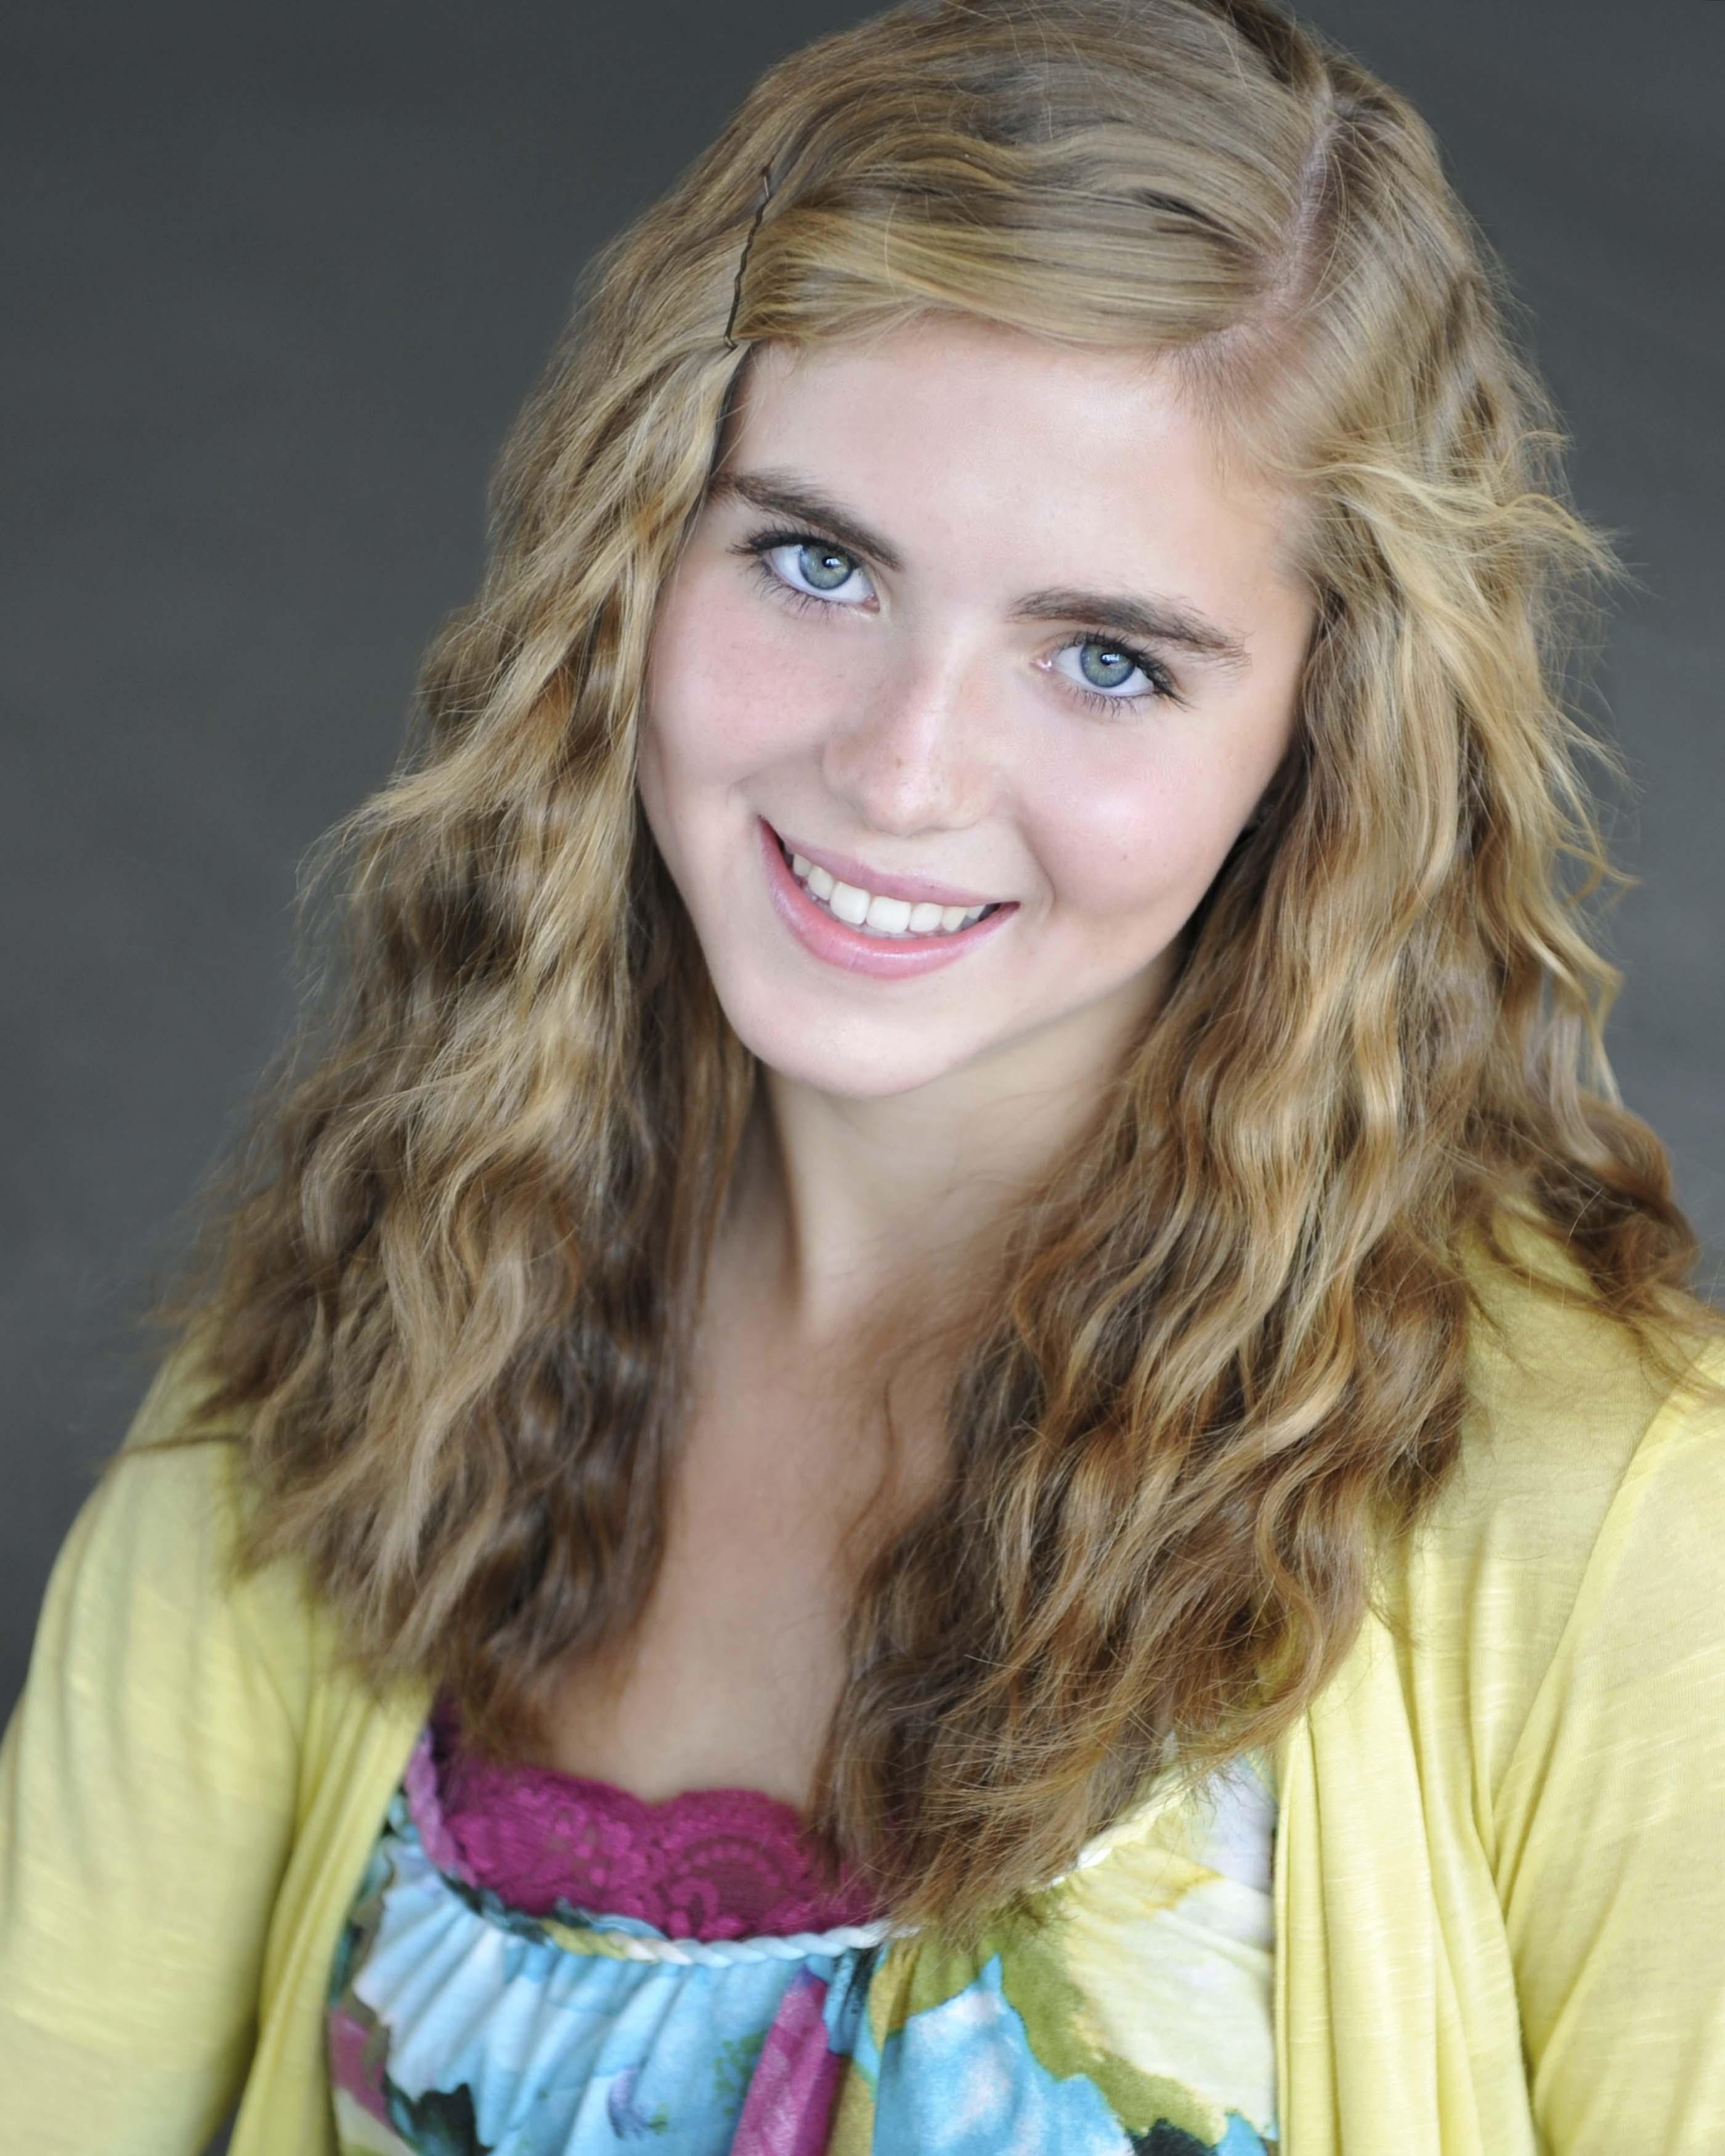 Miss Washington Teen USA 2012 Contestants